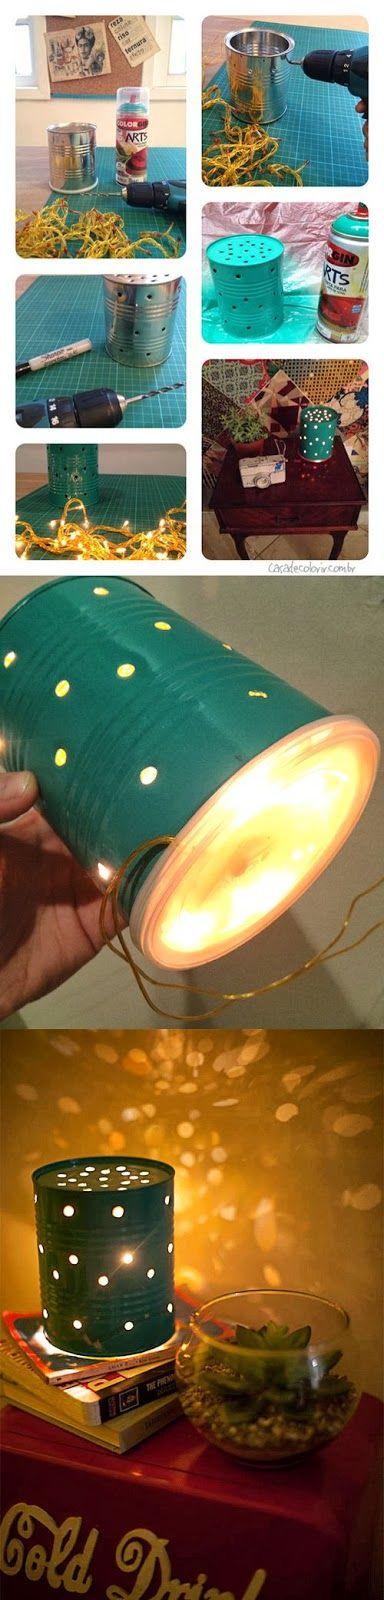 Make a Fire Fly Night Light!